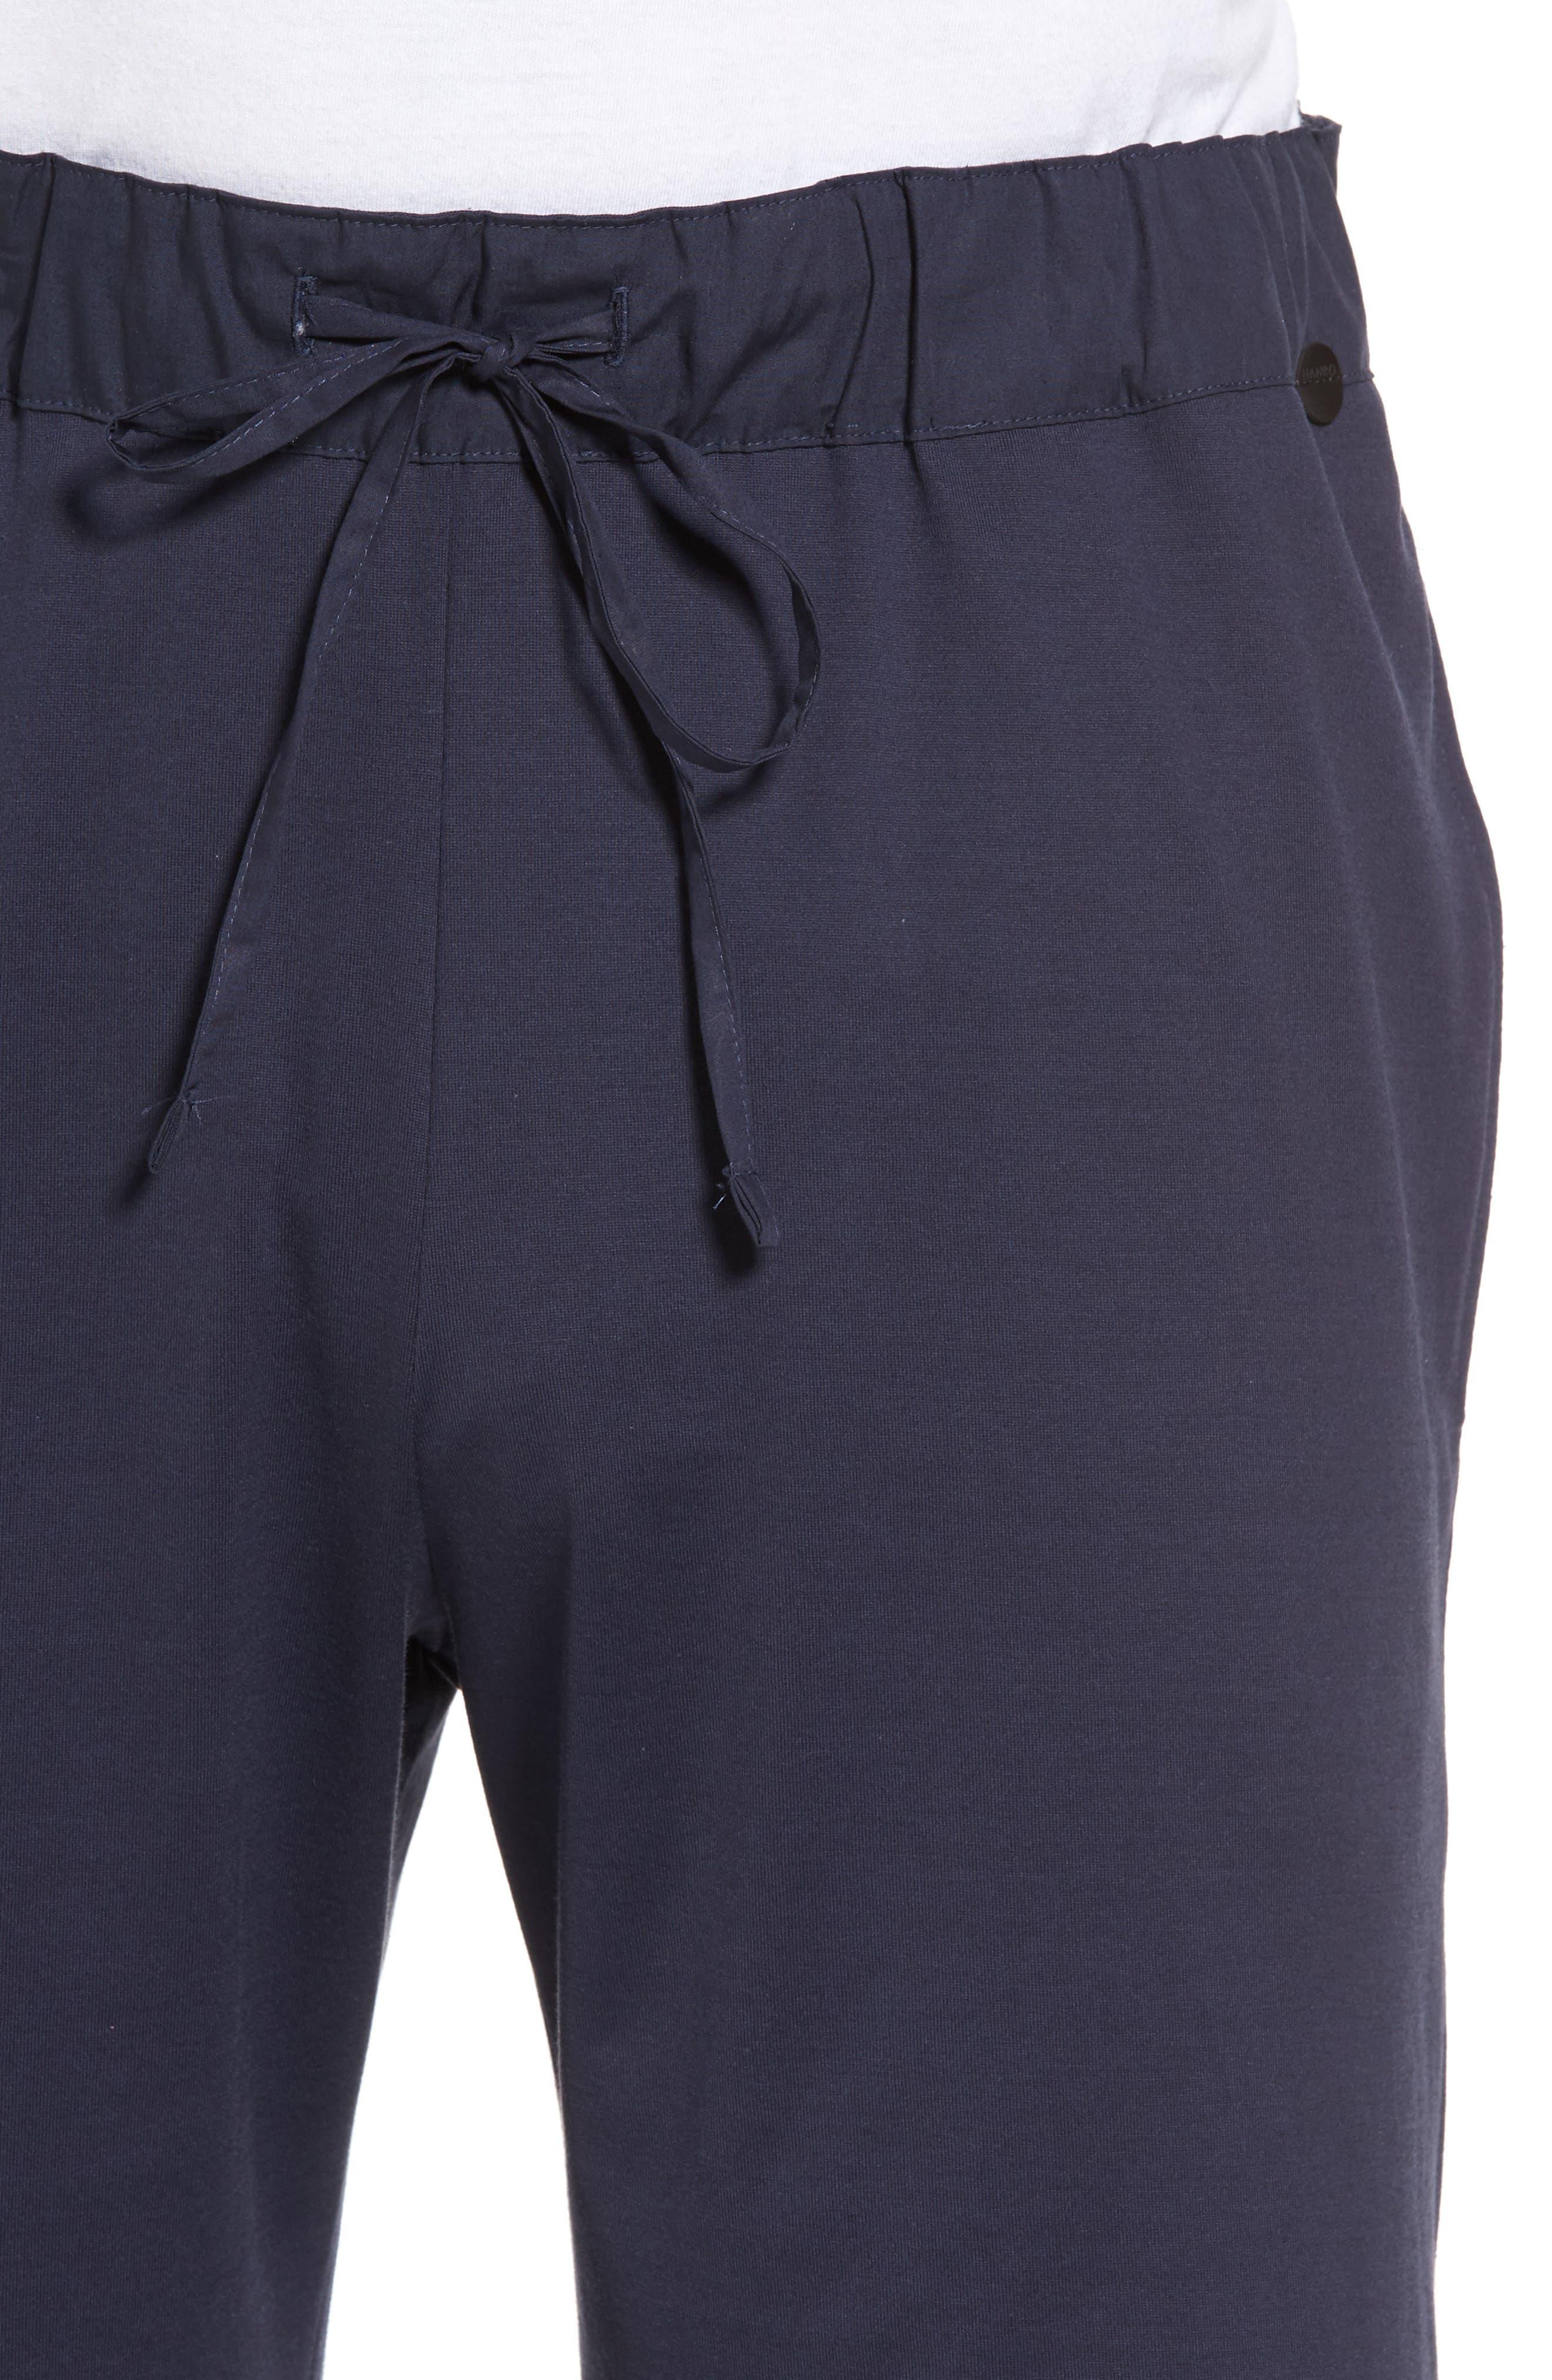 Night & Day Knit Shorts,                             Alternate thumbnail 4, color,                             BLACK IRIS